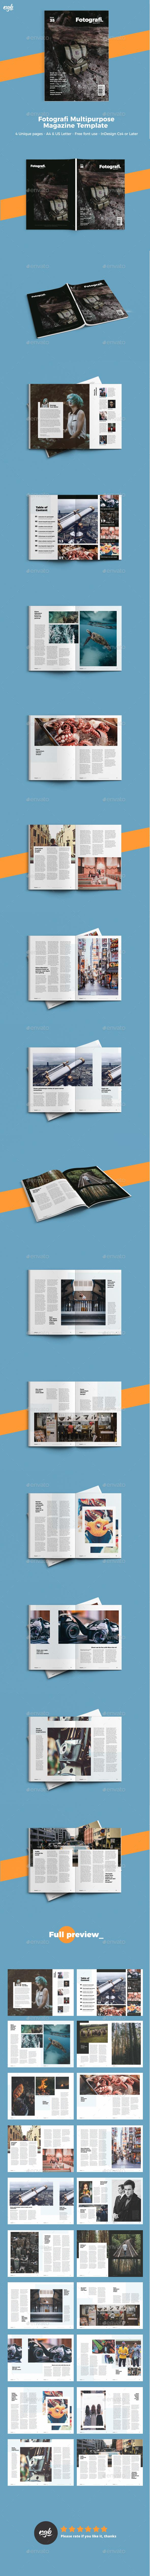 Fotografi Mulipurpose Magazine - Magazines Print Templates